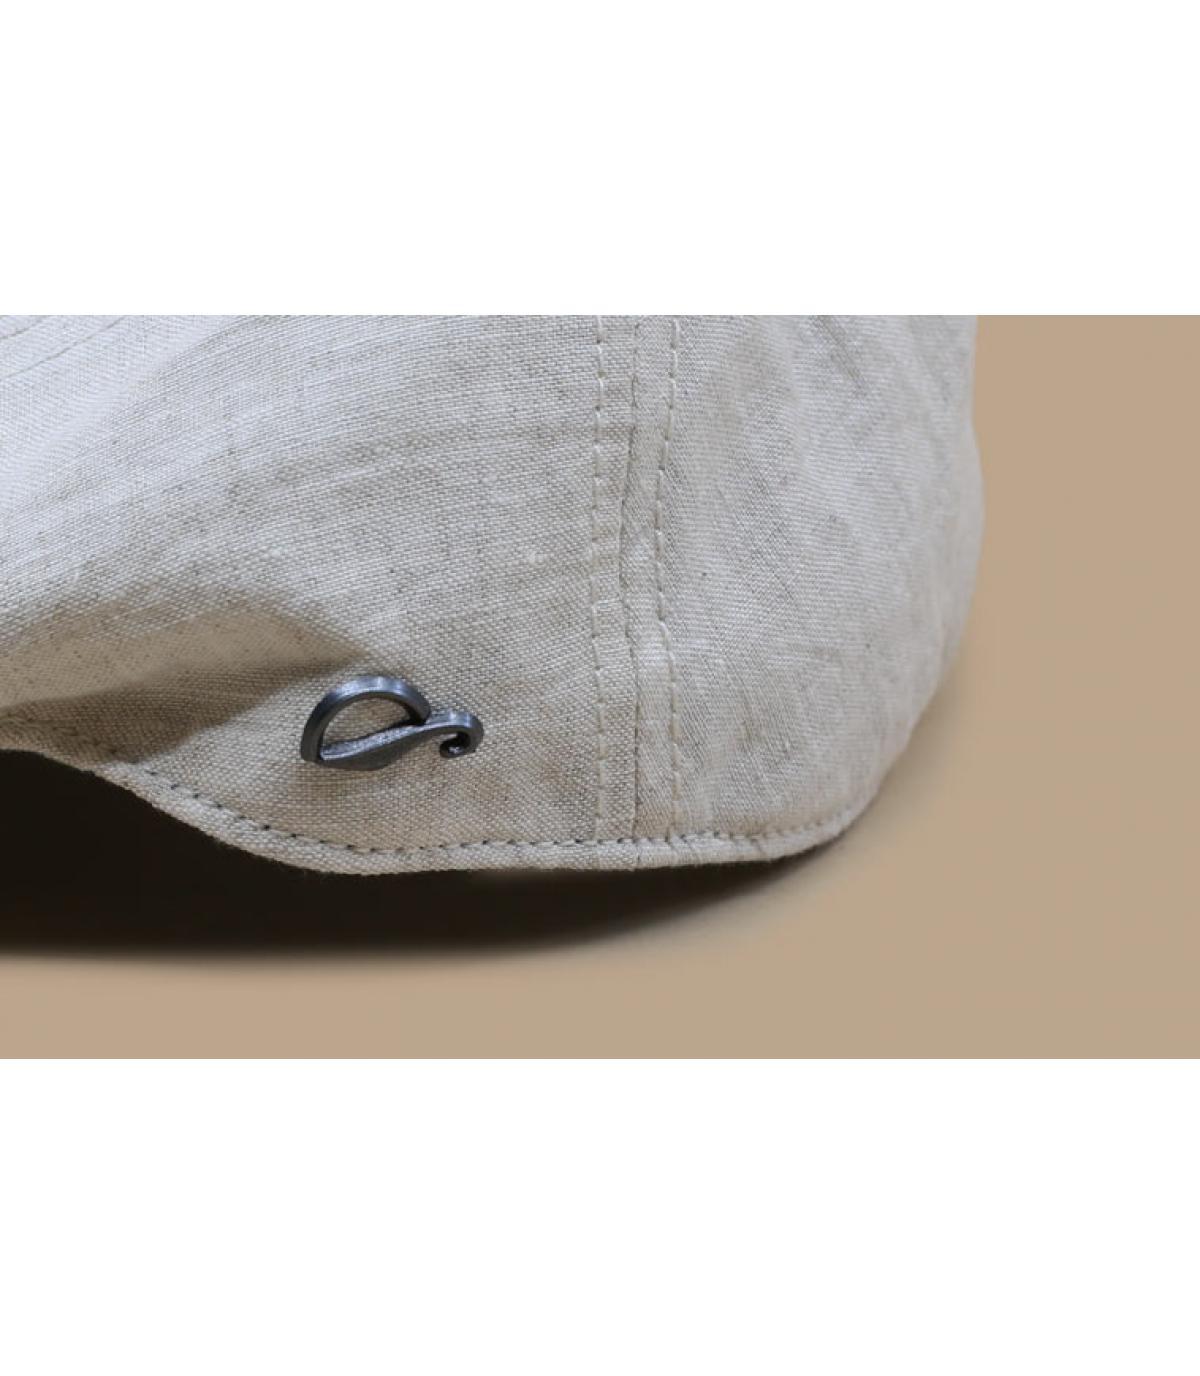 Details Oxford Linen beige - afbeeling 3